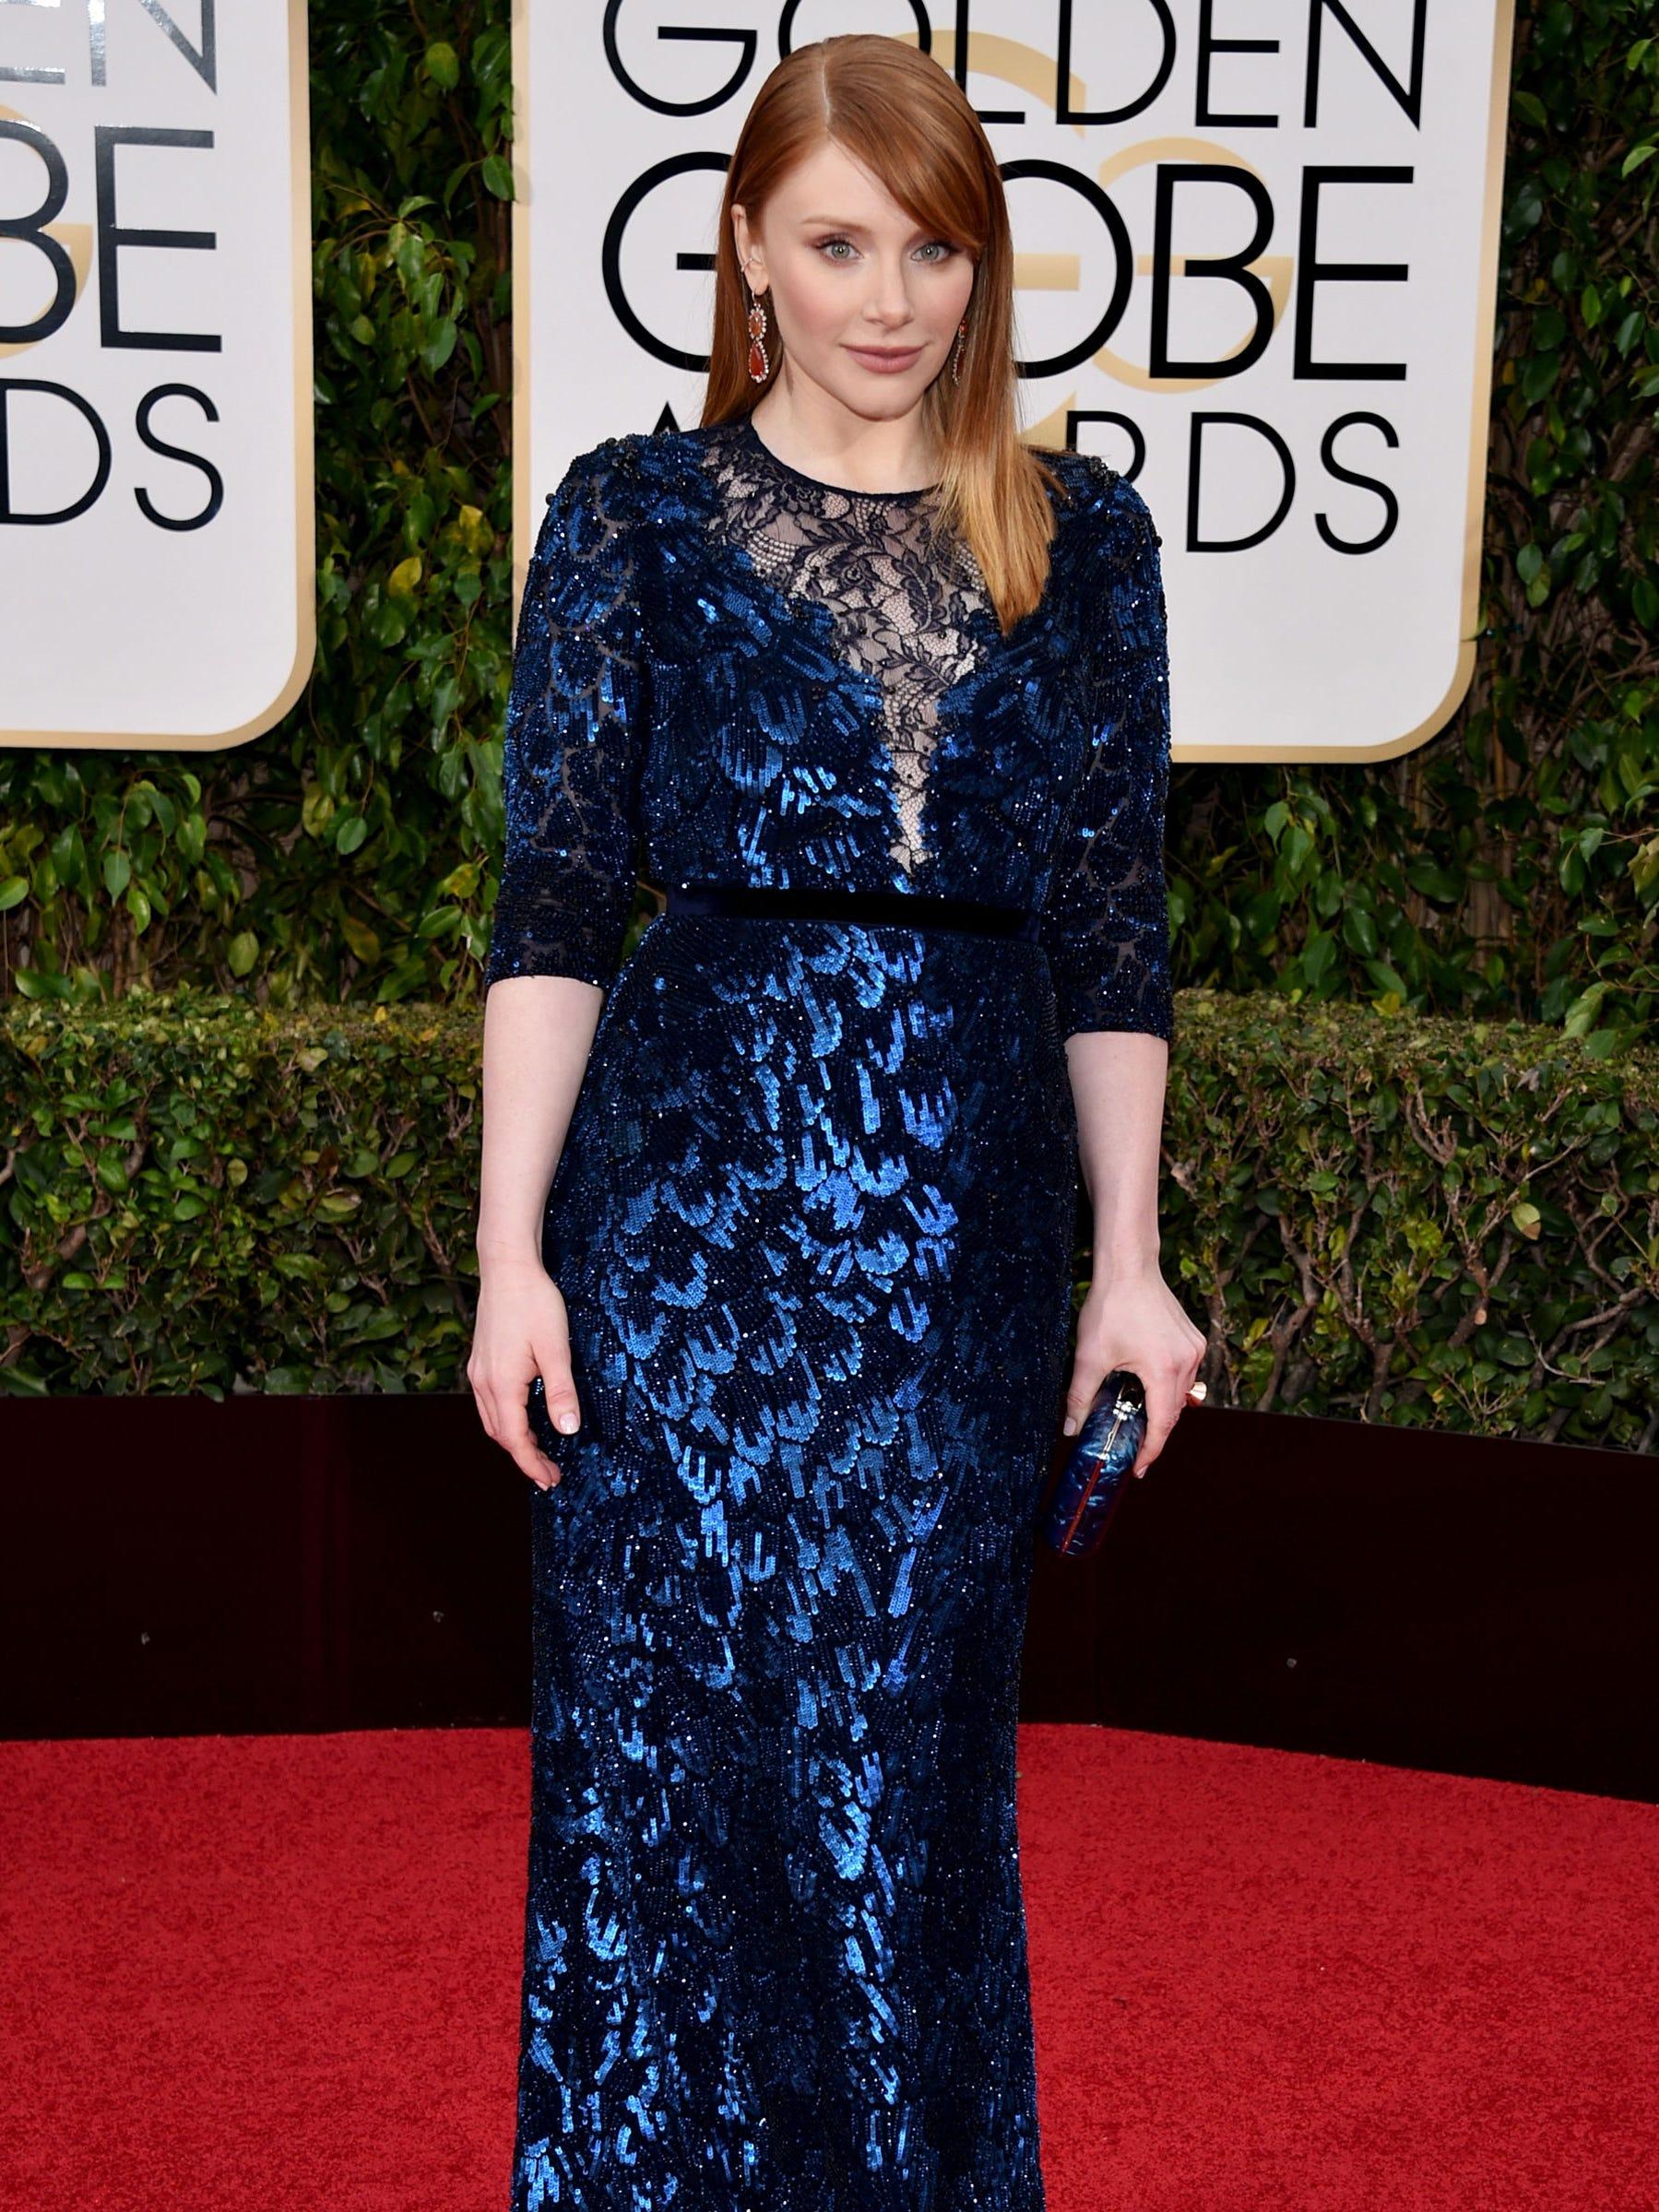 Bryce Dallas Howard Golden Globes 2016 Dress Size 6